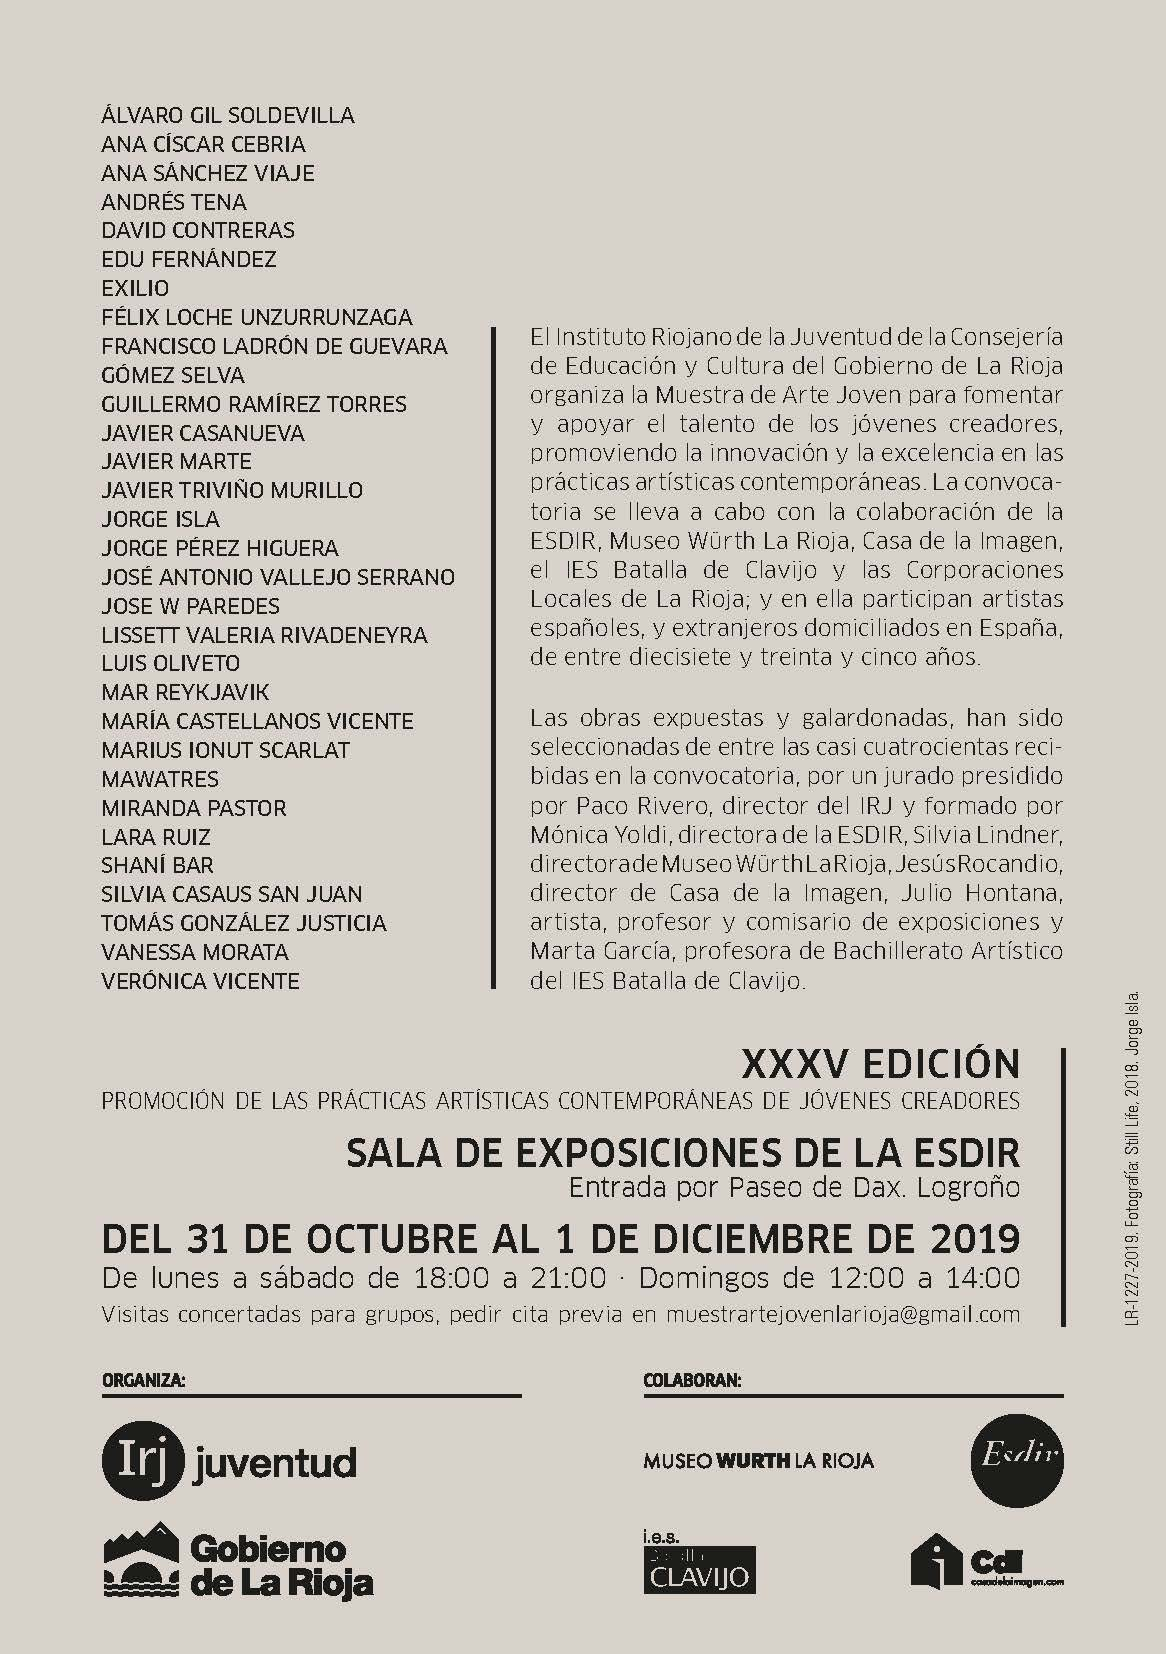 XXXV Muestra de Arte Joven en La Rioja